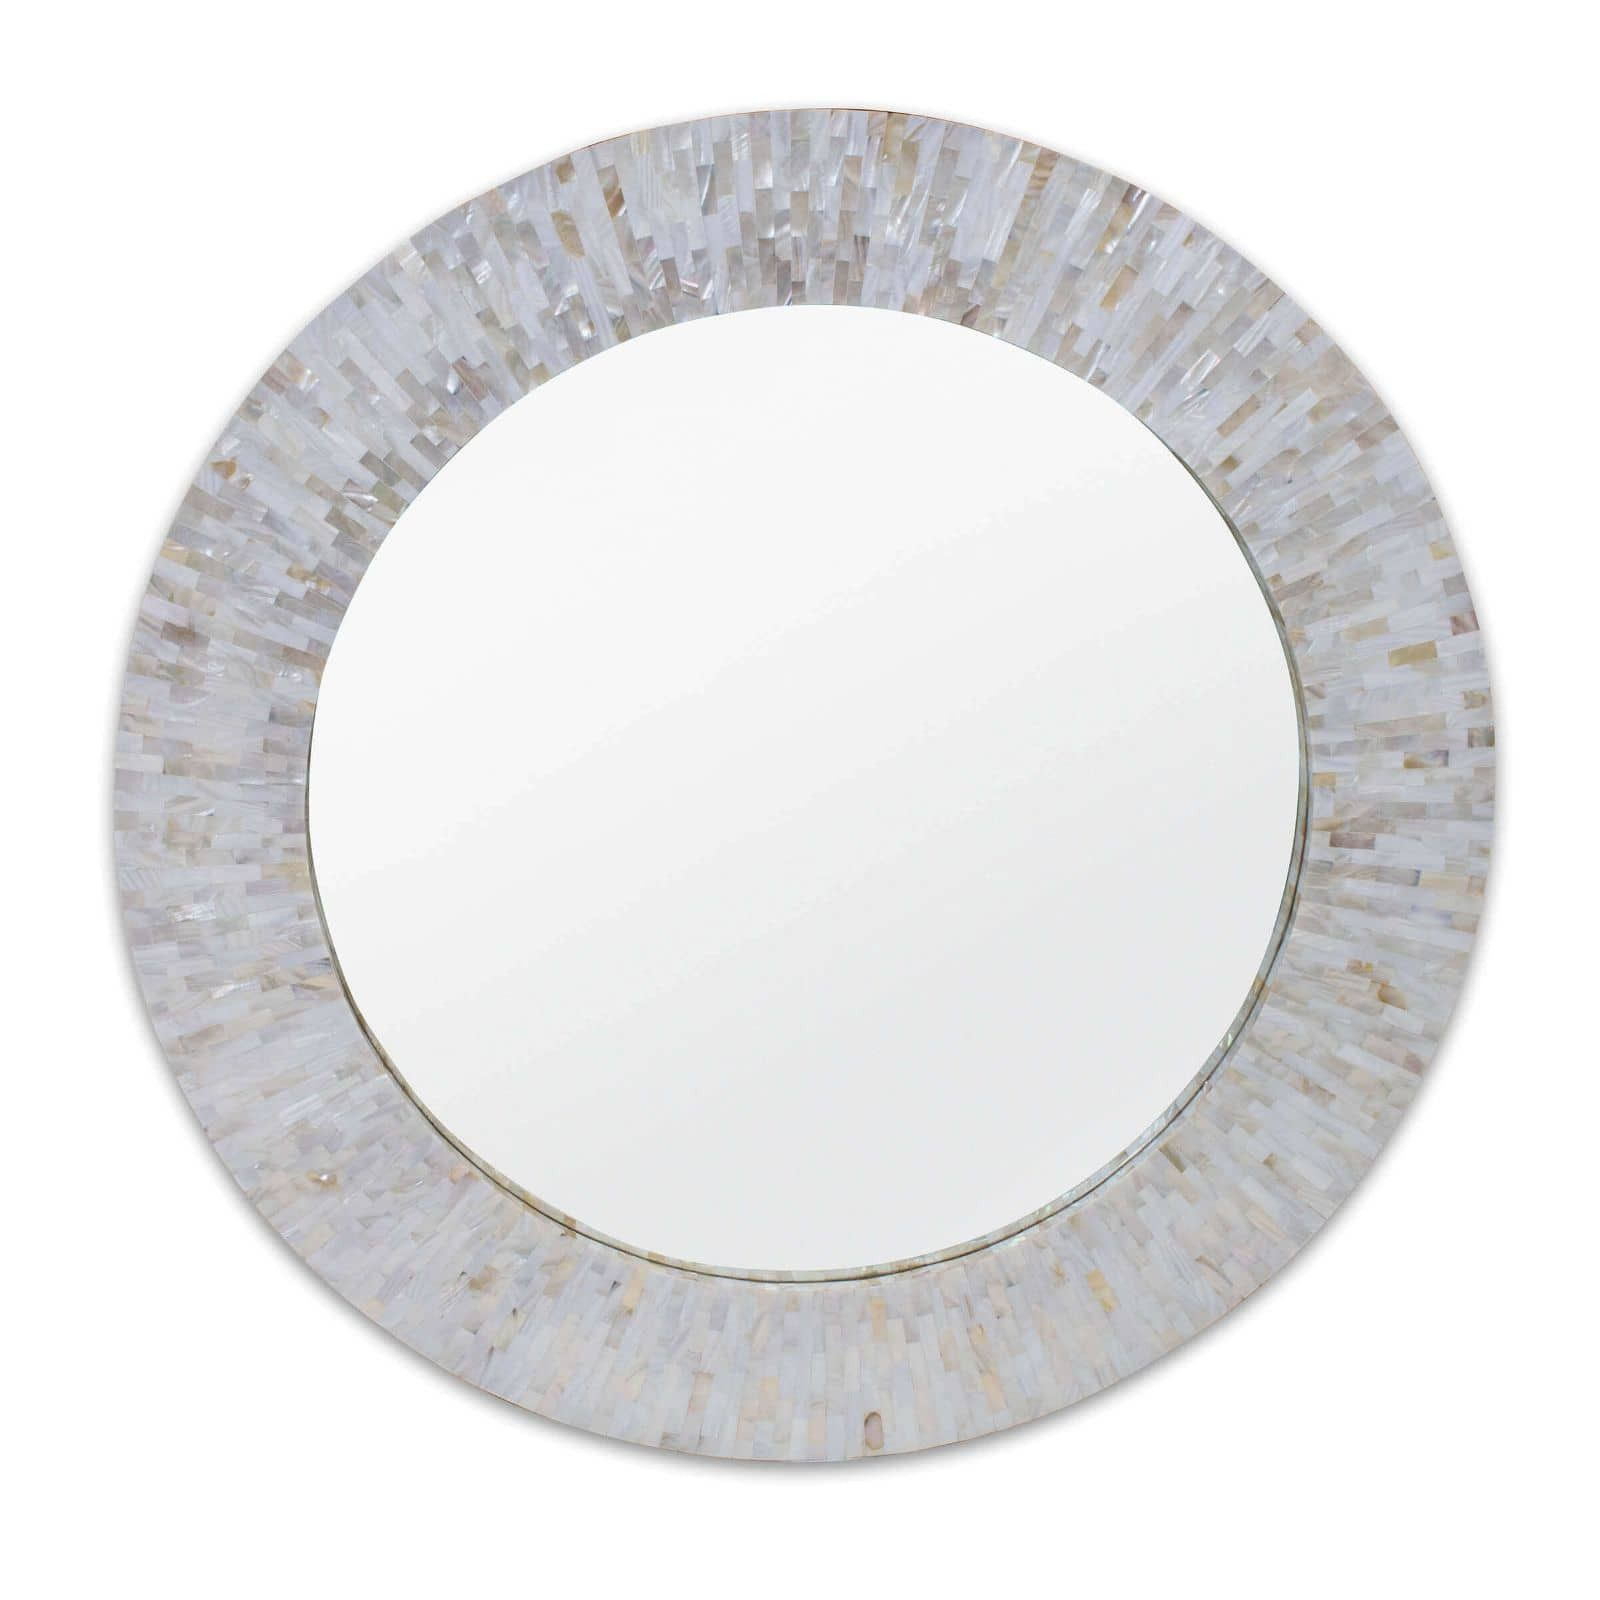 regina andrew chantal mirror